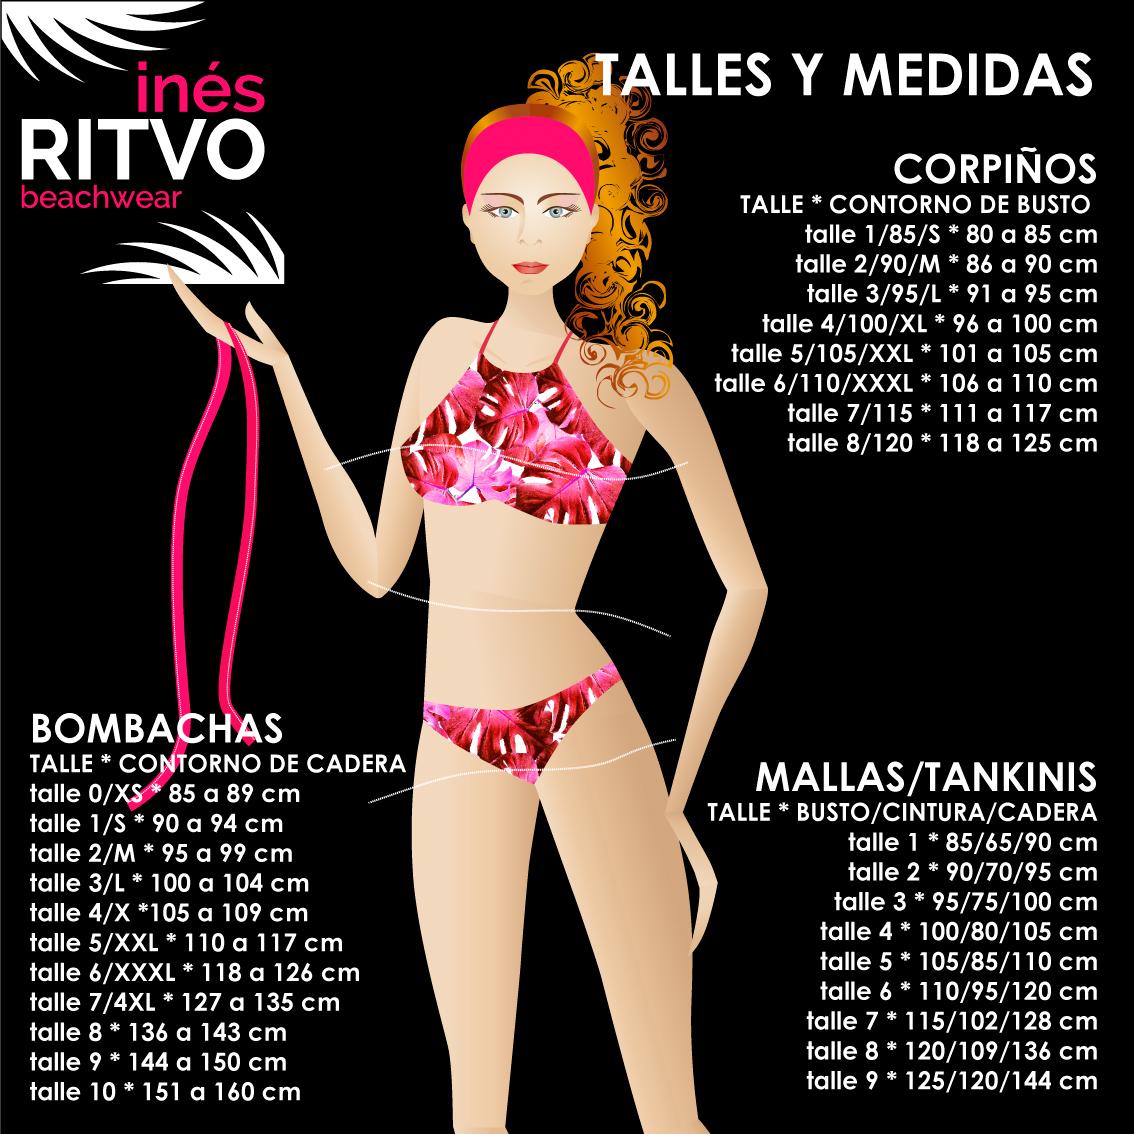 Talles Y Bikinis Talles Bikinis Mallas Medidas Y Medidas pLUMqSzVG